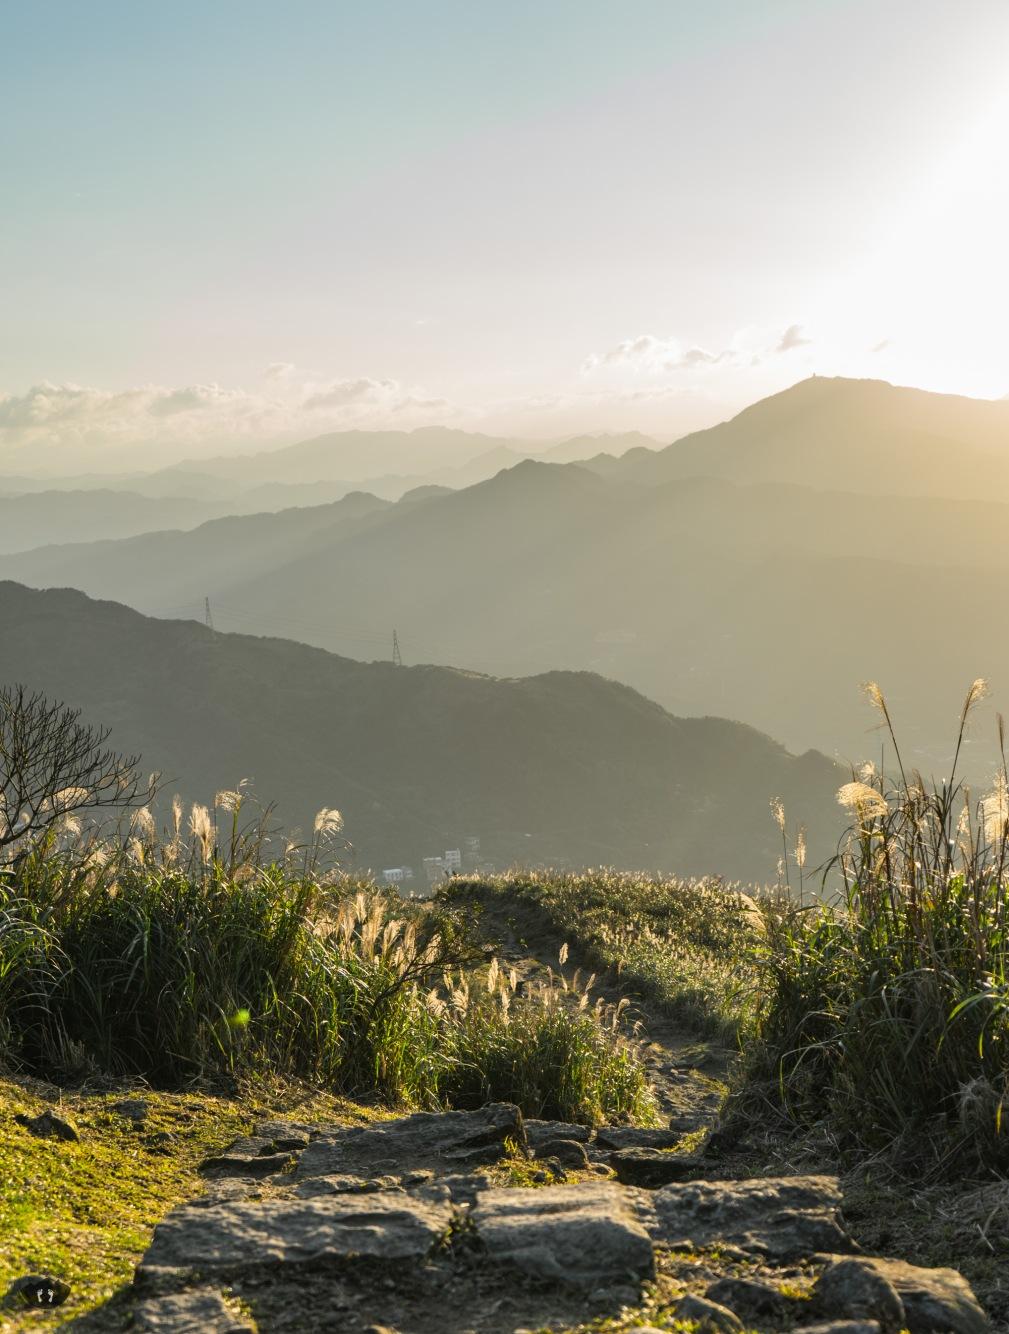 Keelung Mountain, Jiufen